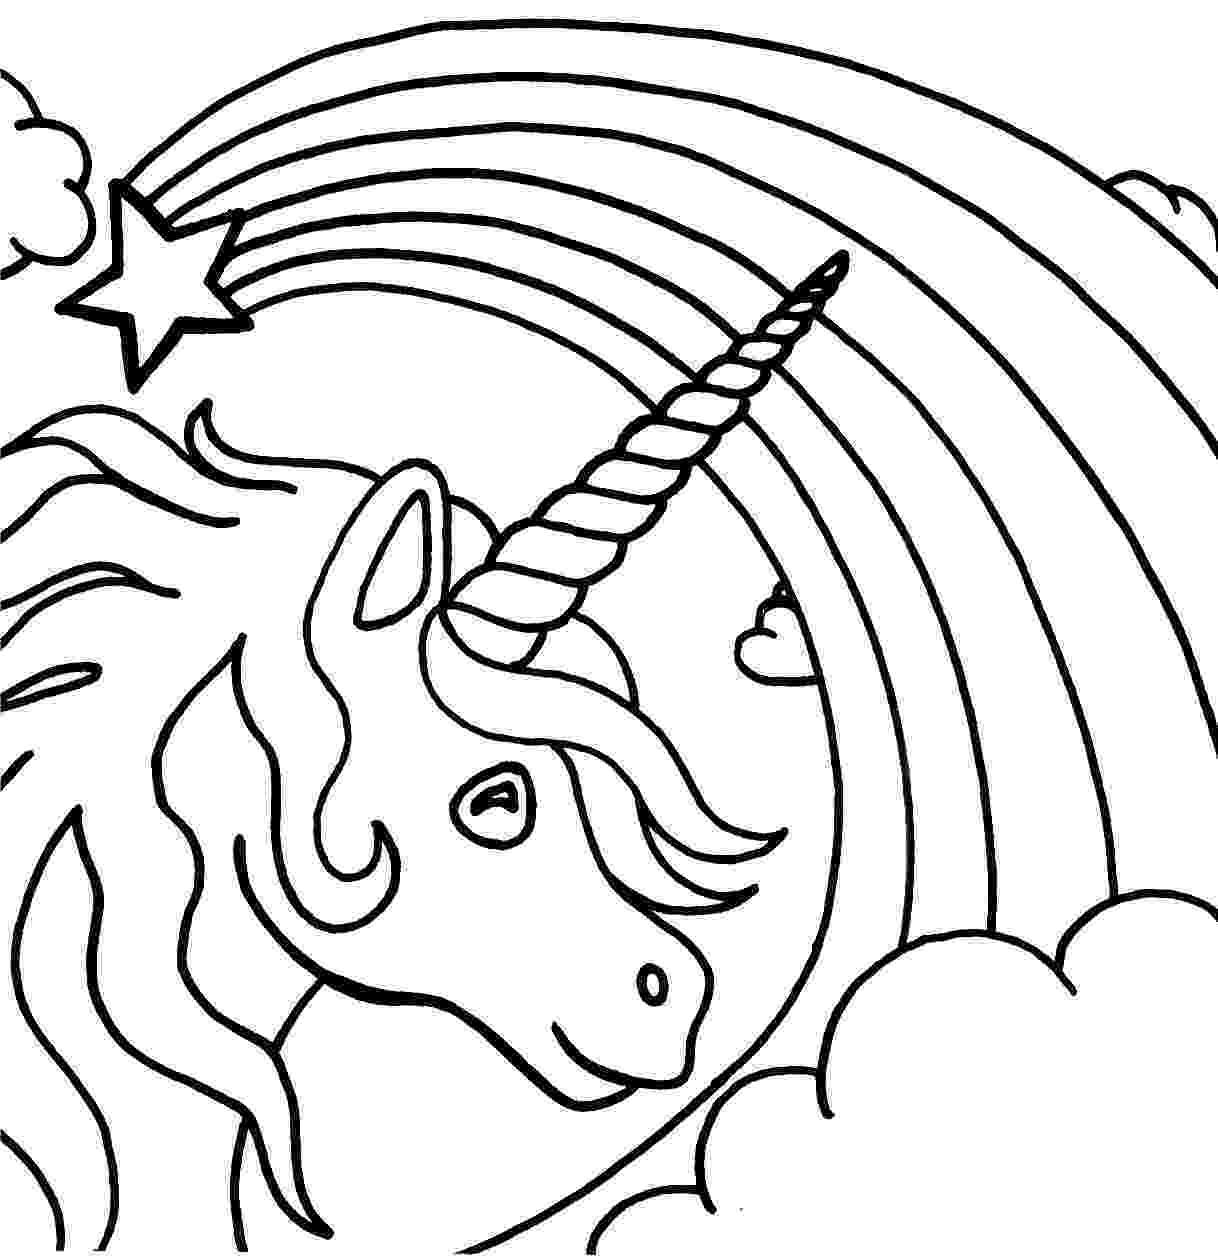 coloring page unicorn free printable unicorn coloring pages for kids unicorn coloring page